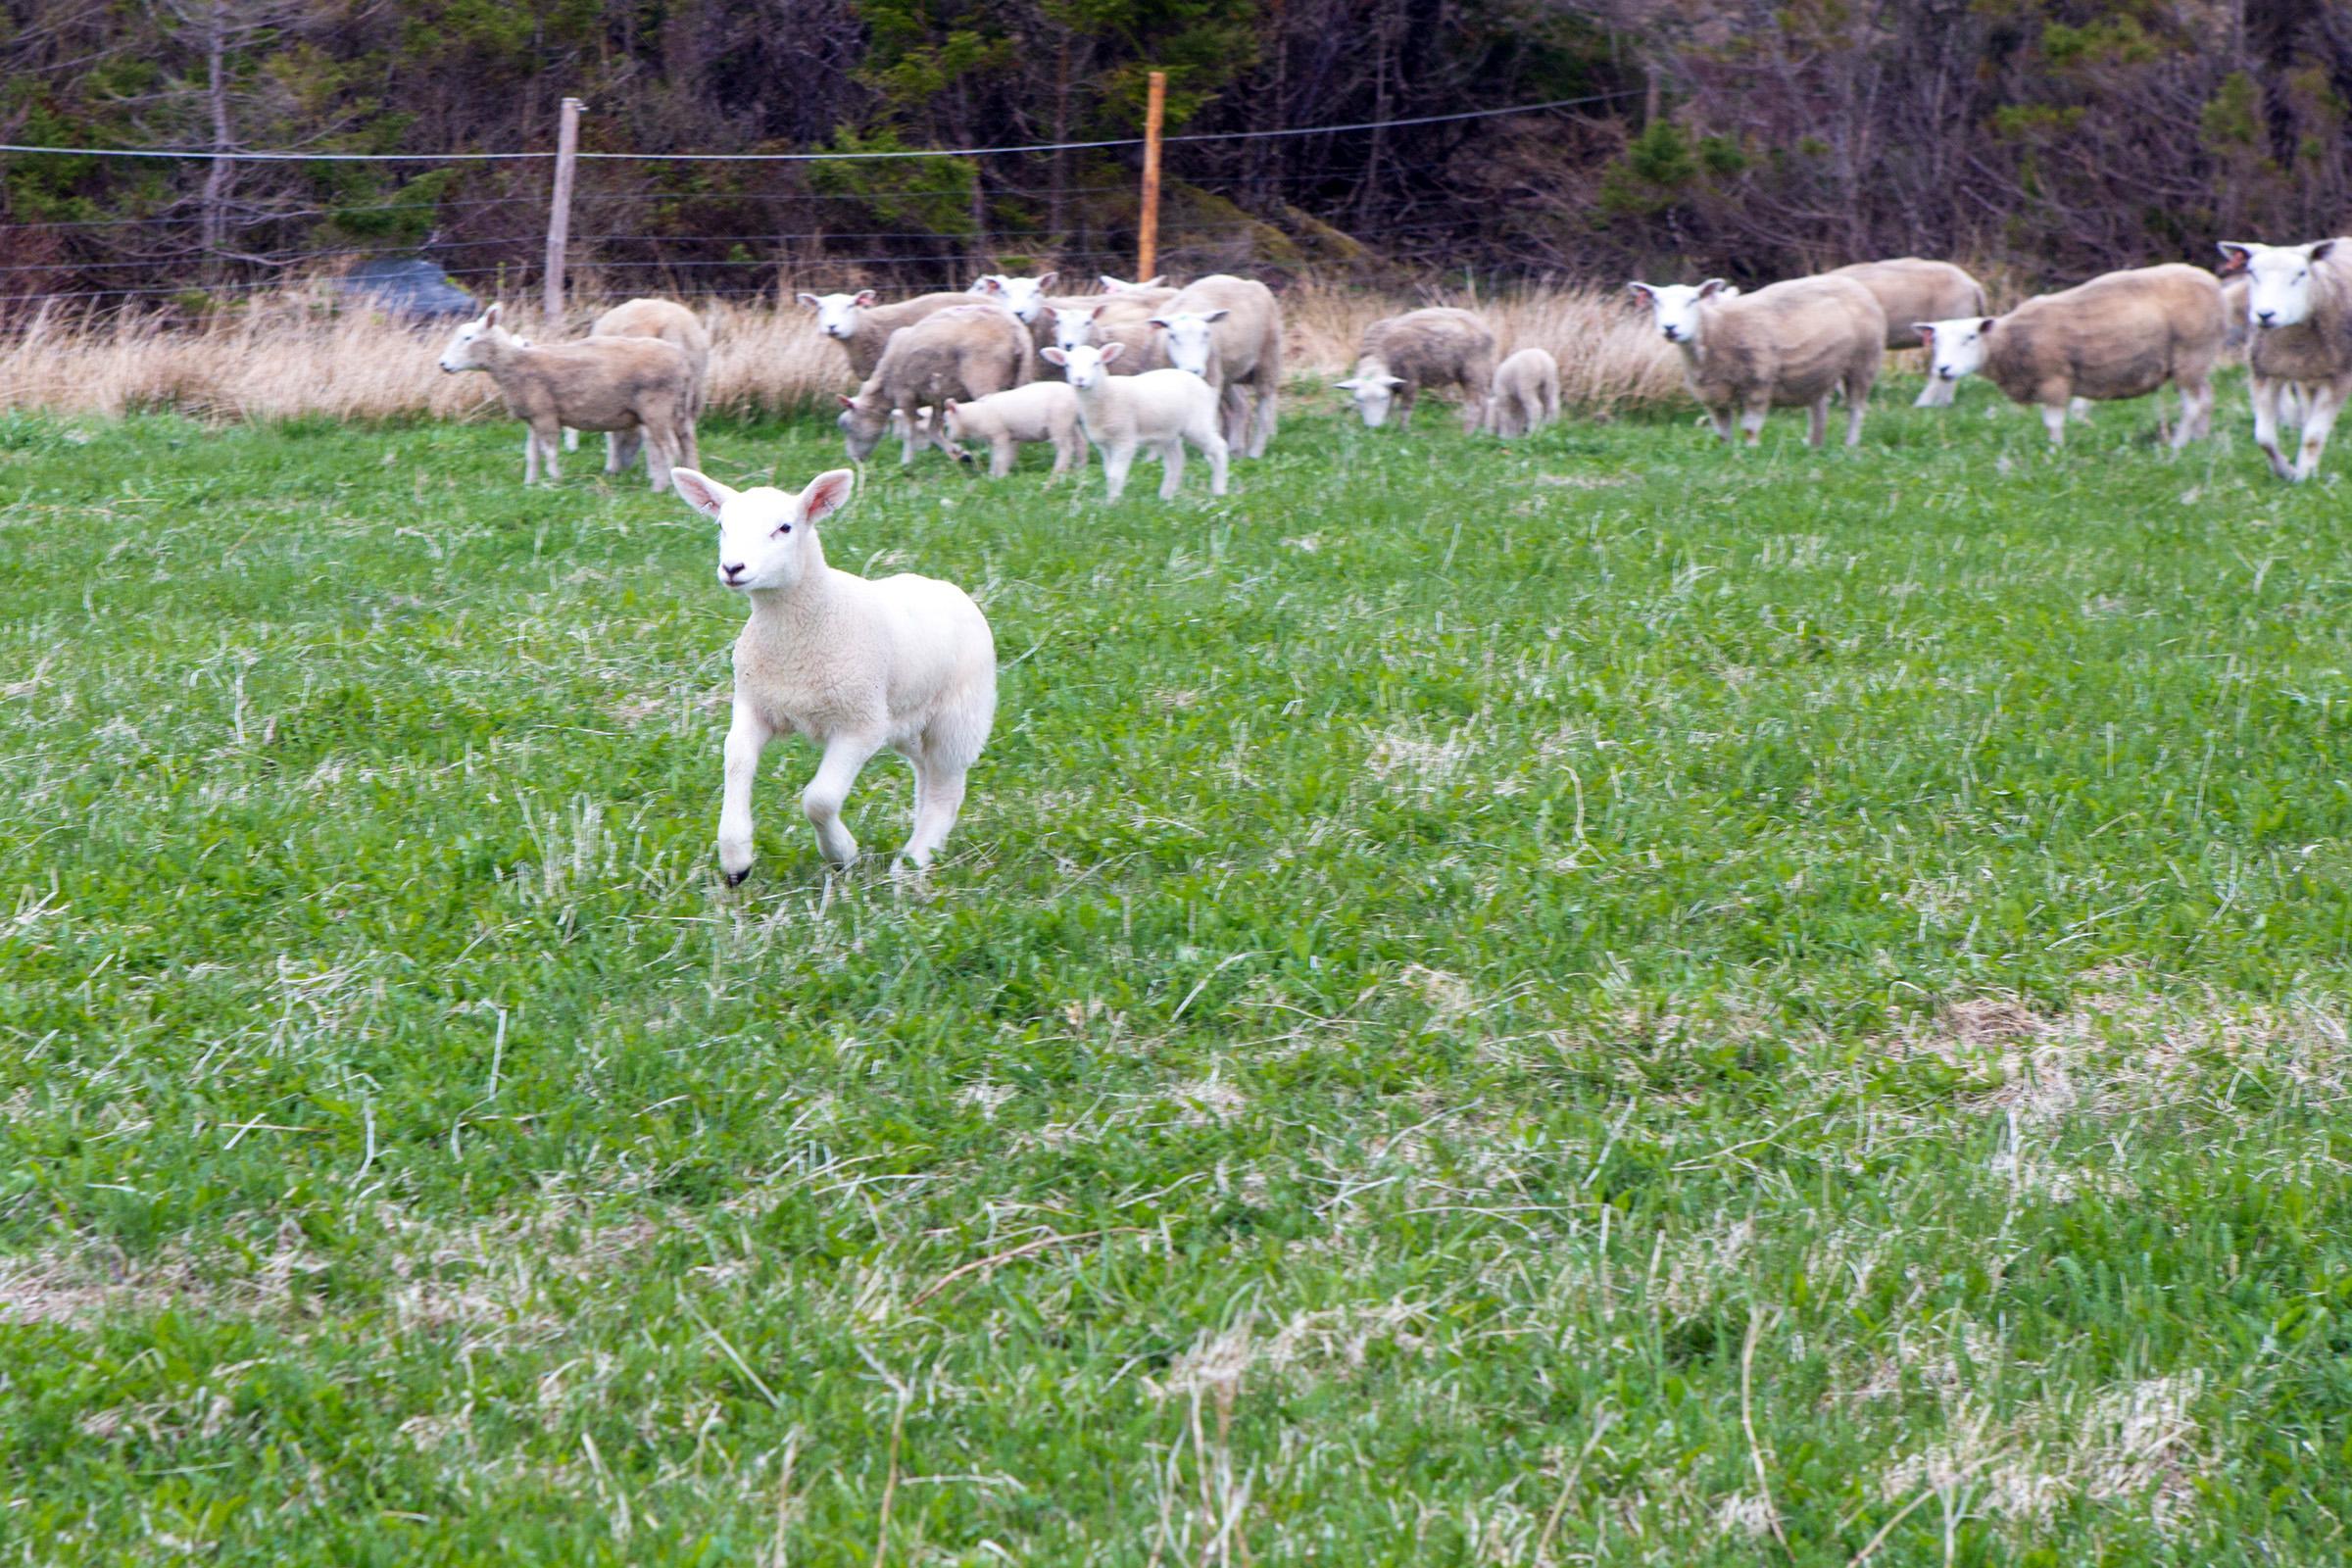 Sheep, Affectionate, New, Love, Mammal, HQ Photo